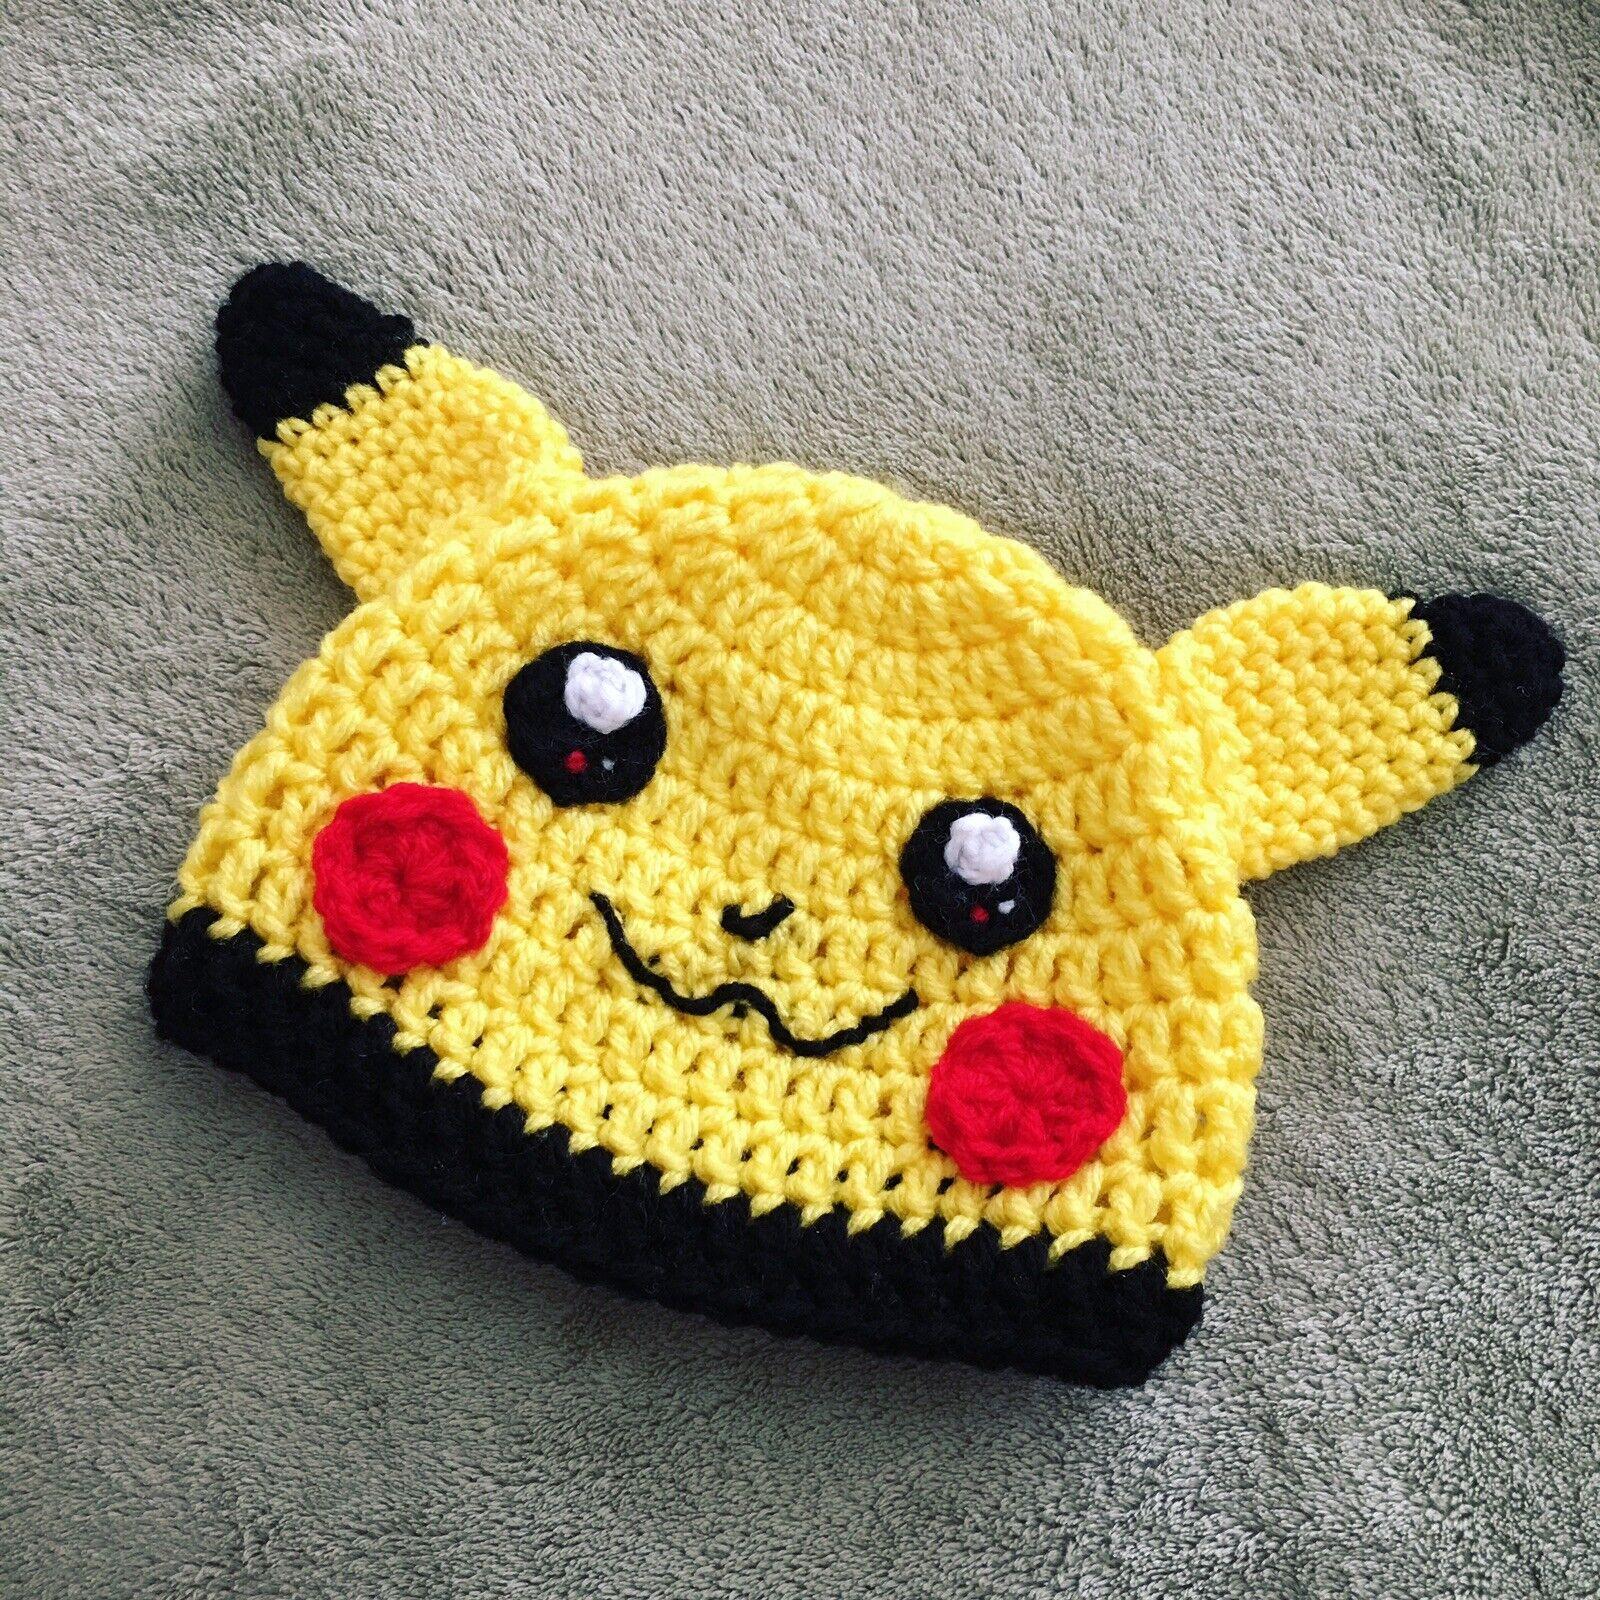 Psyduck Amigurumi Tutorial - Crochet Pokemon - YouTube | 1600x1600